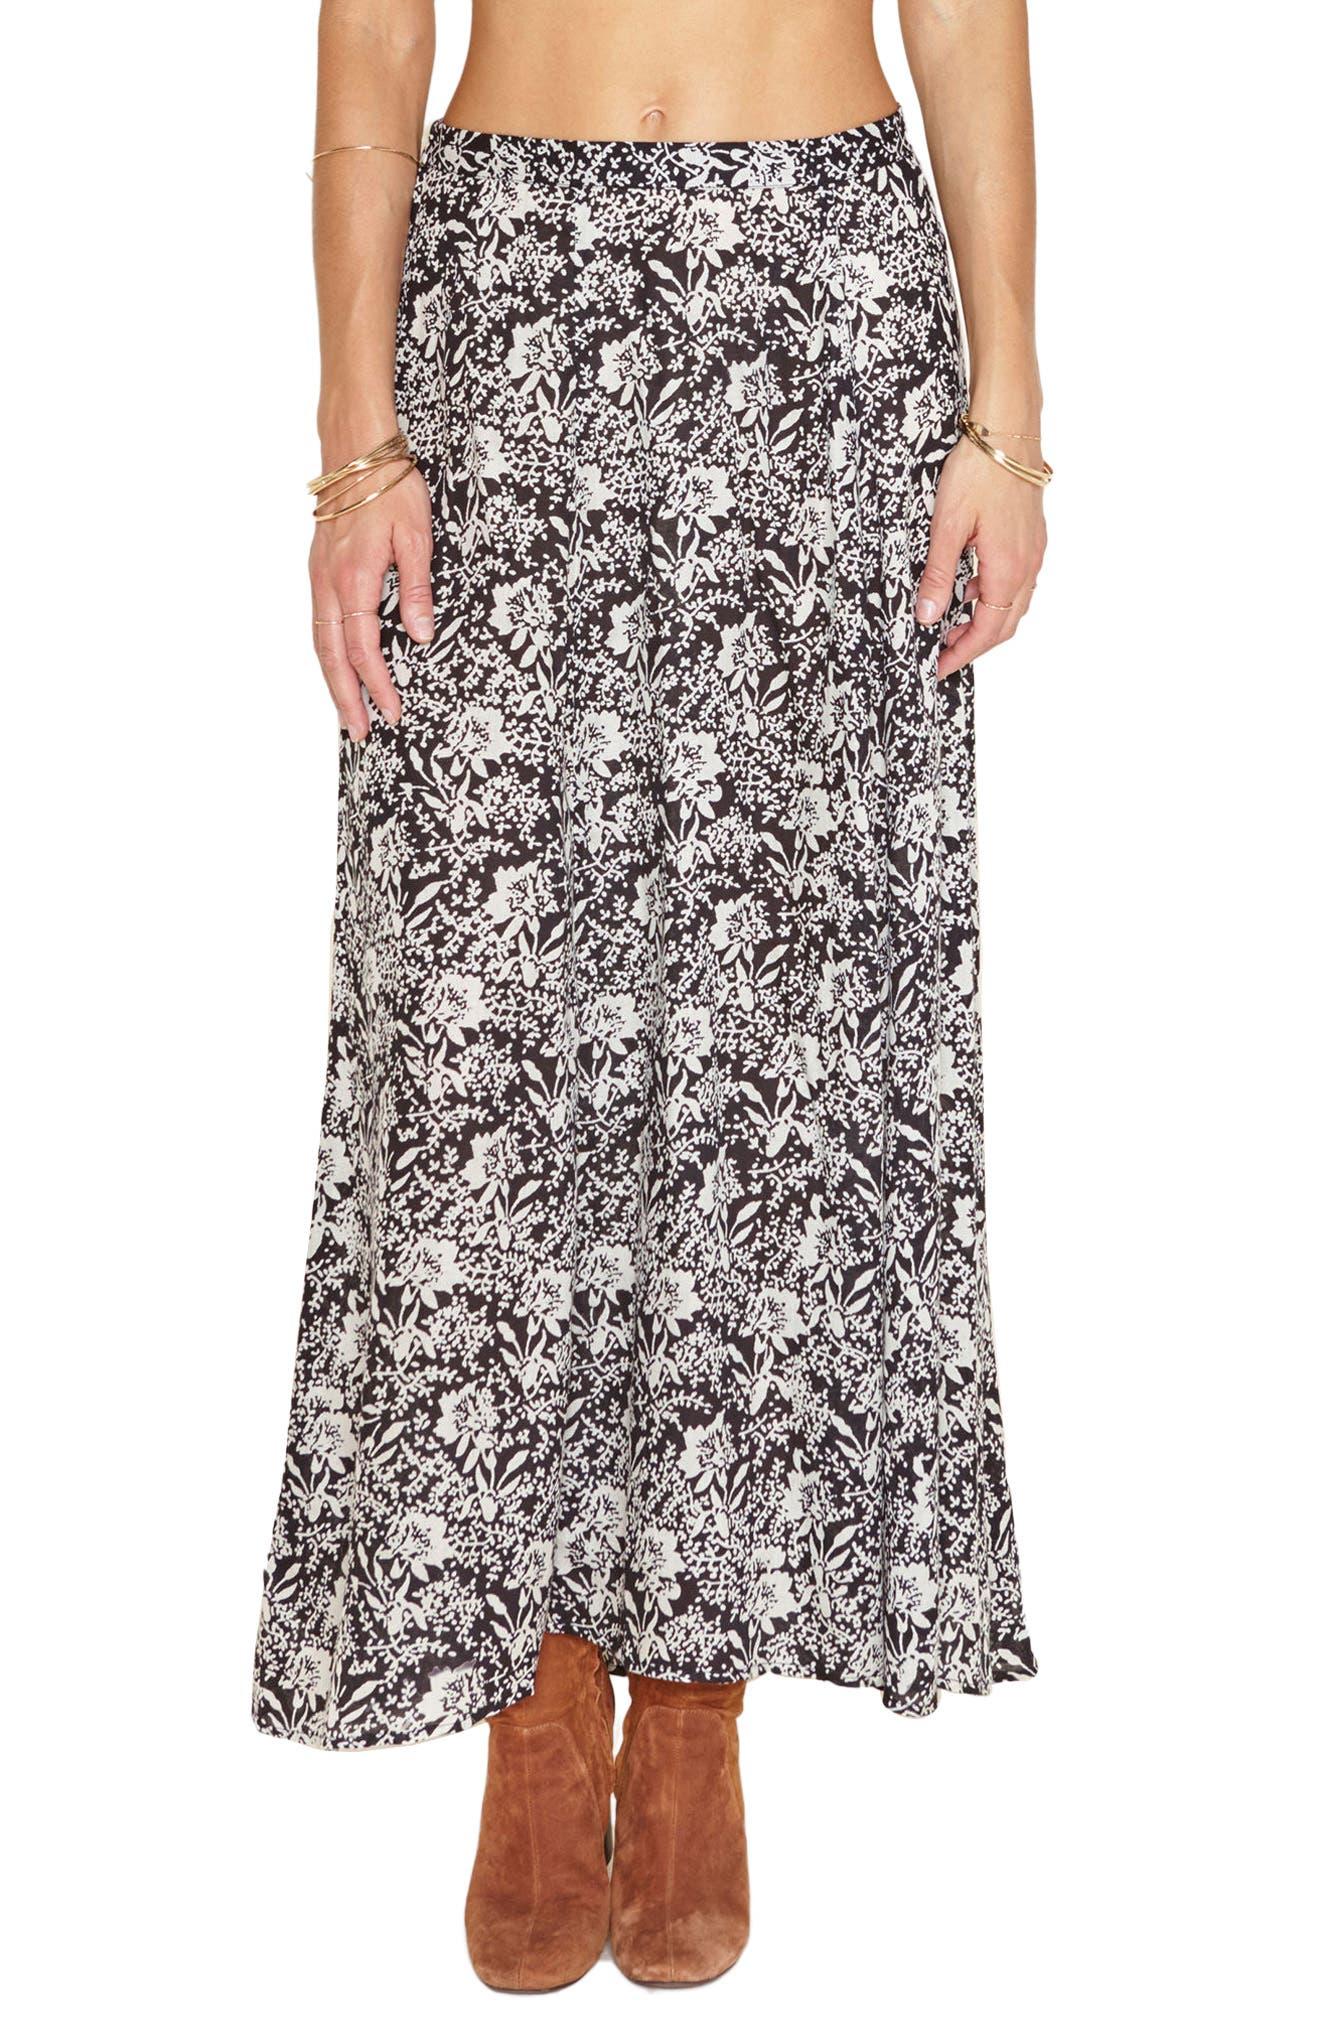 Shiva Maxi Skirt,                             Main thumbnail 1, color,                             001